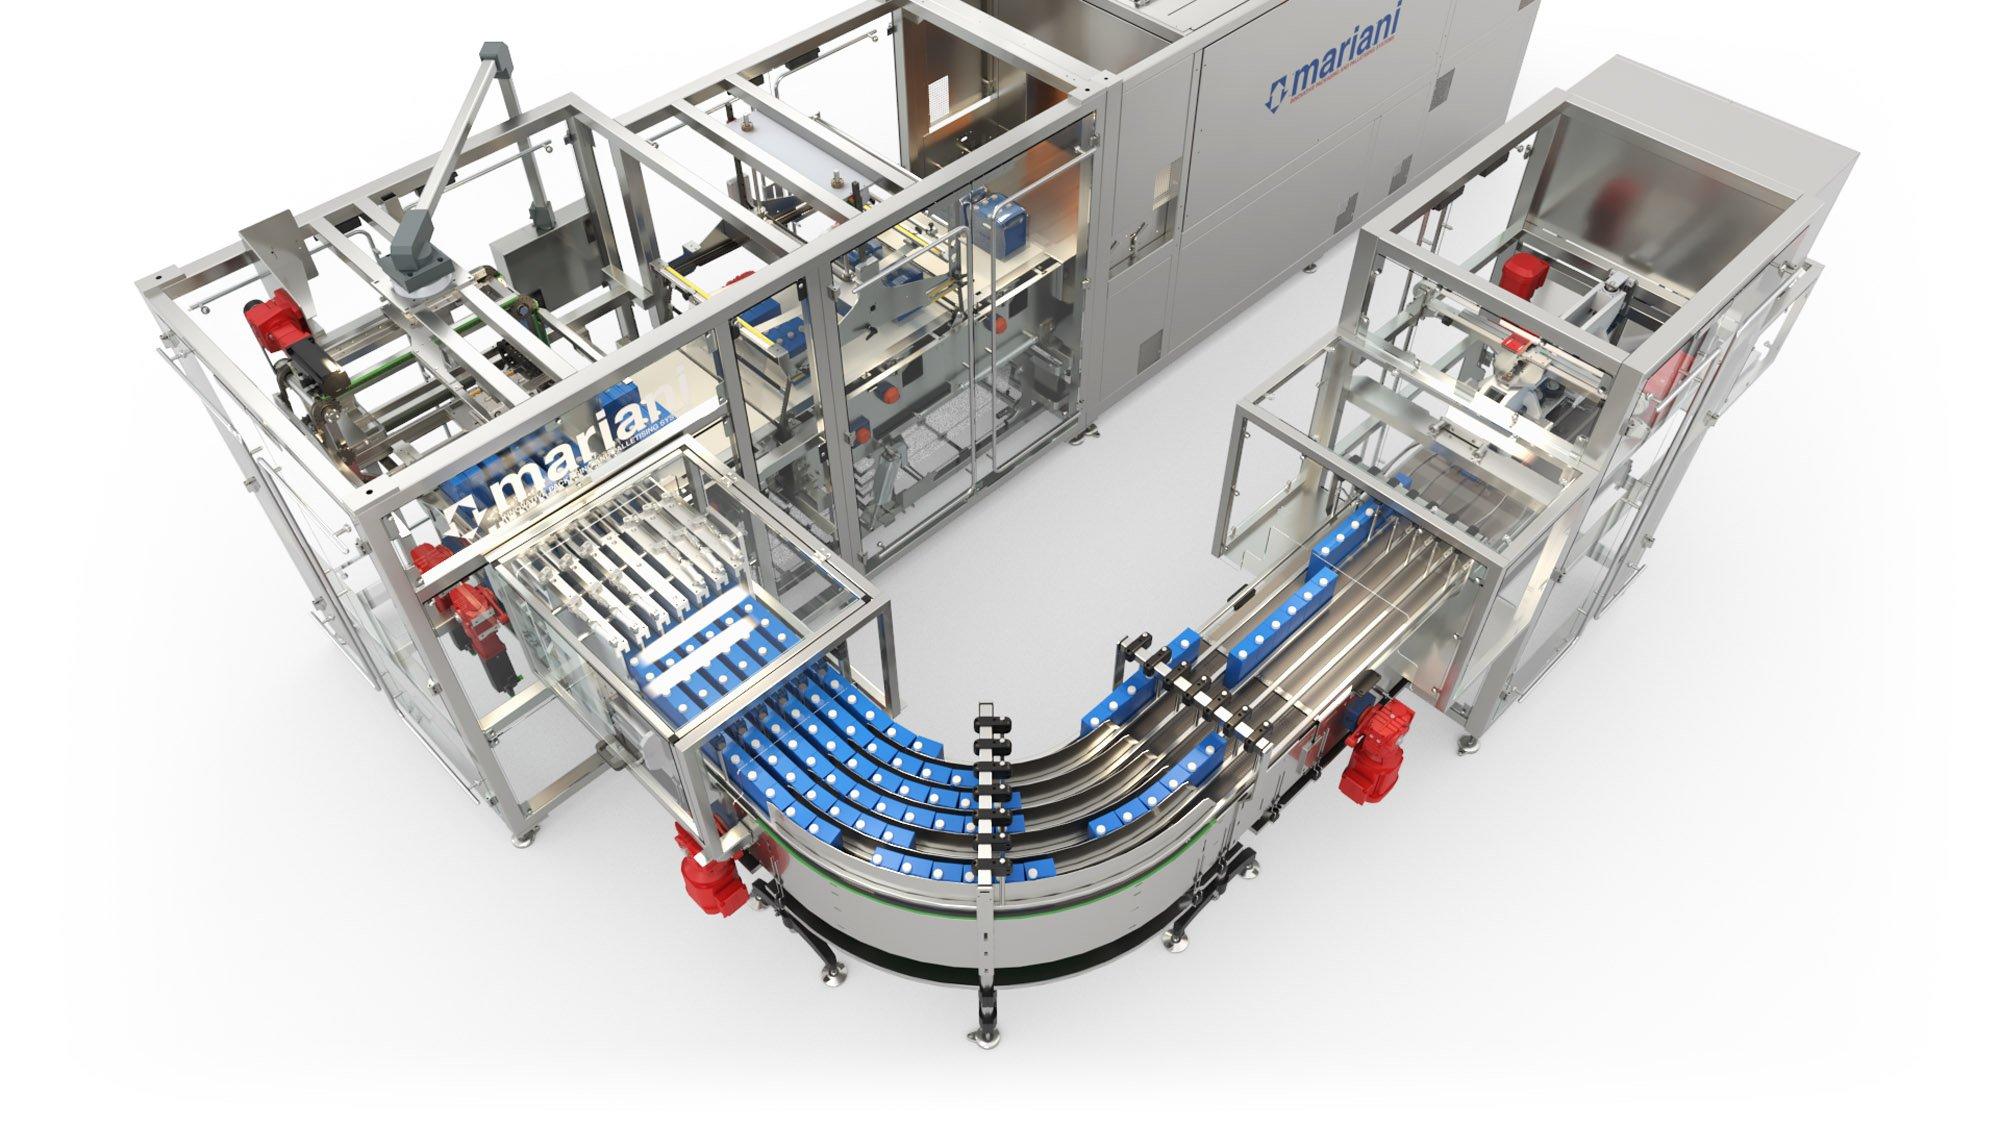 TRM-700 LF accumulation conveyors - Mariani Srl